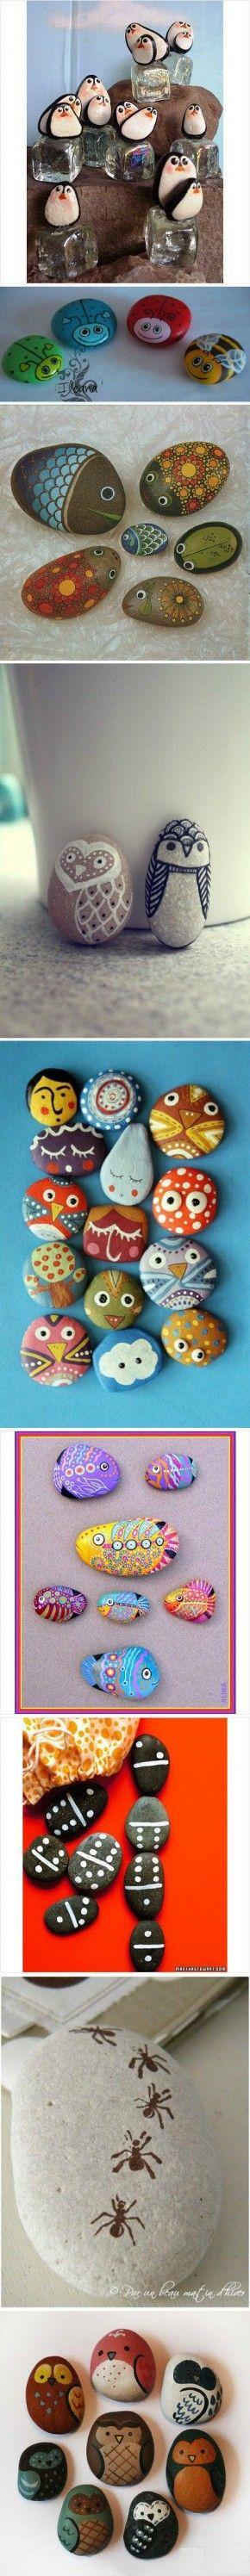 stenen beschilderen, leuke ideeen.